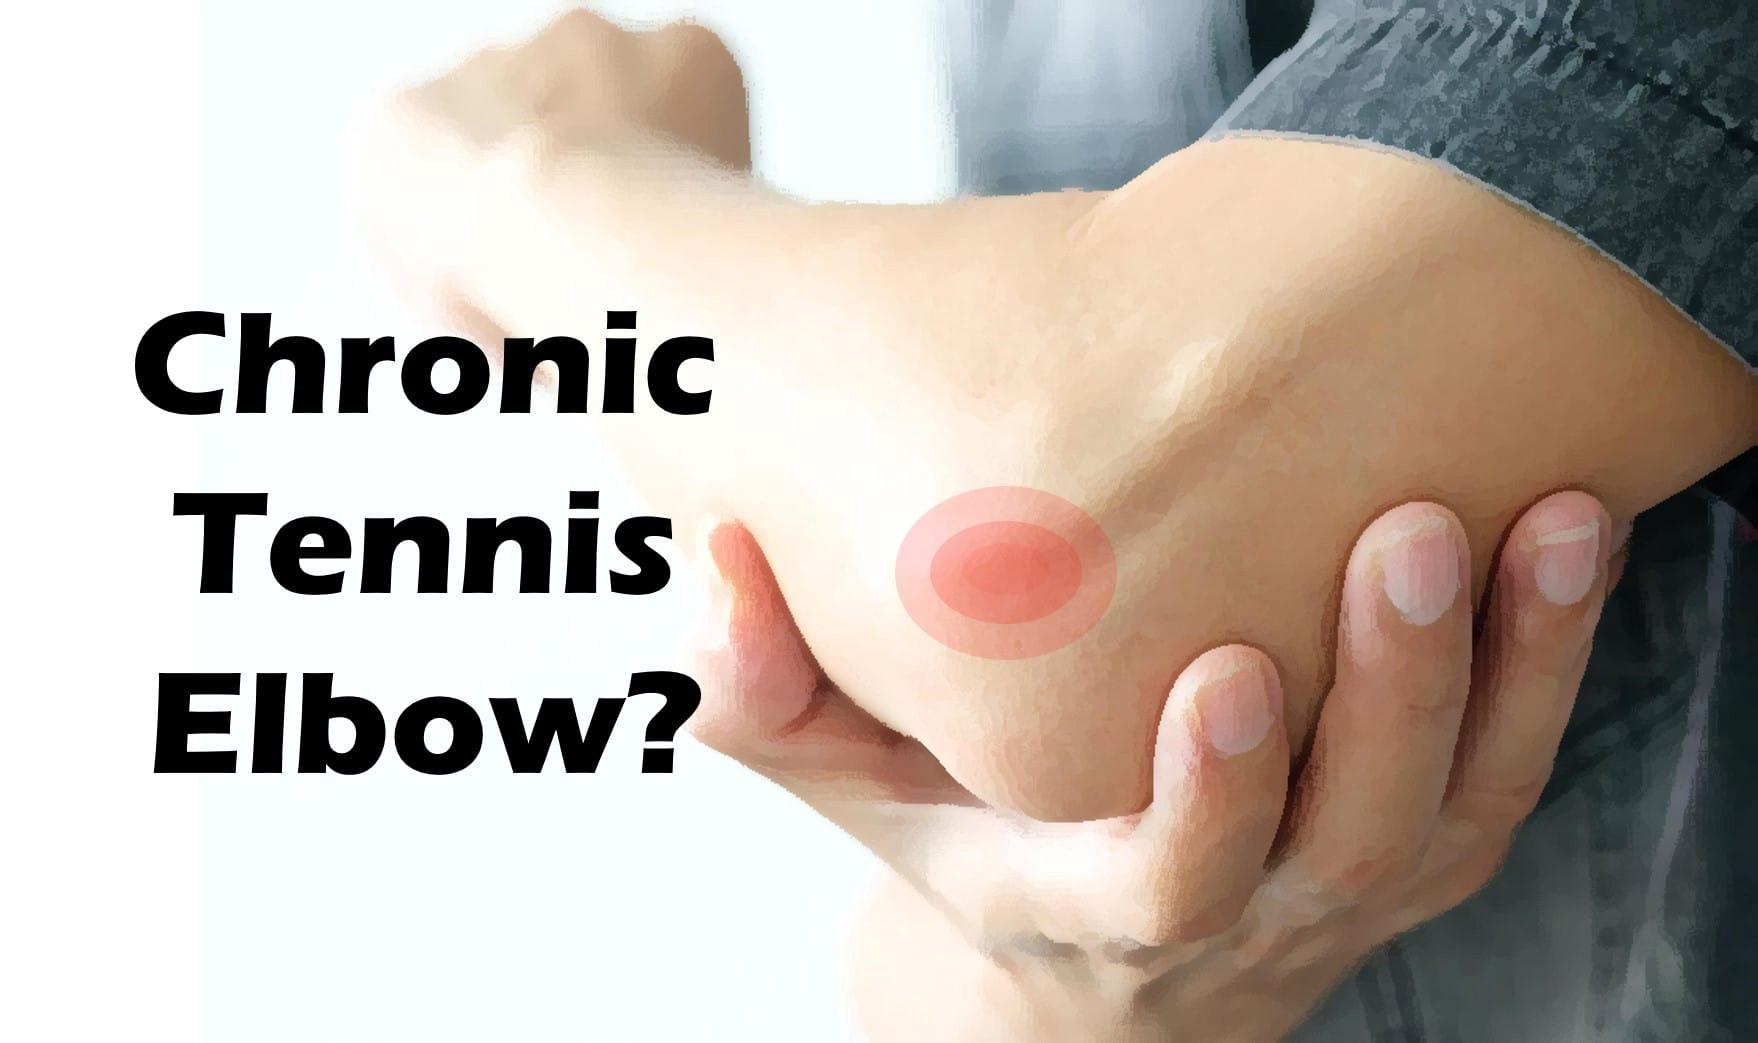 Chronic Tennis Elbow?